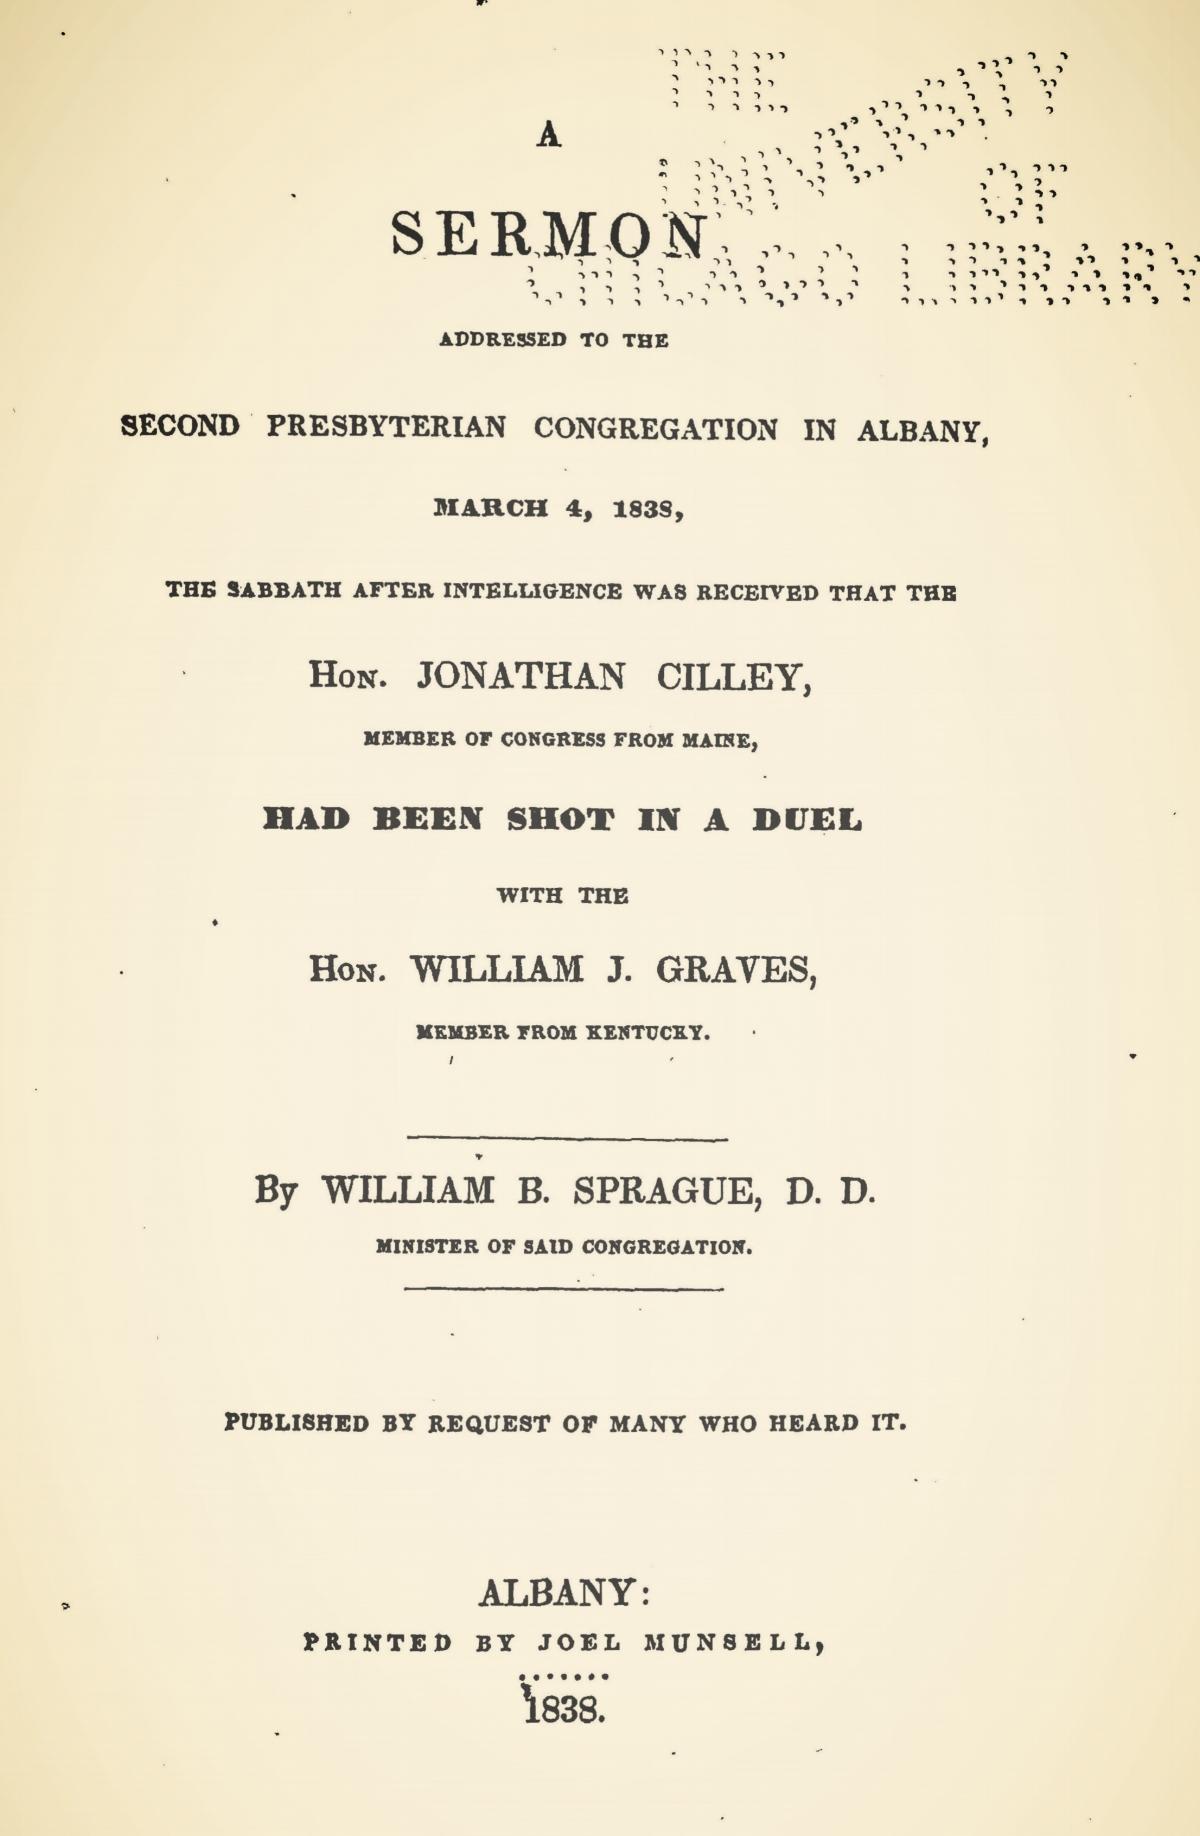 Sprague, William Buell, 1838 Sermon re Duel Title Page.jpg